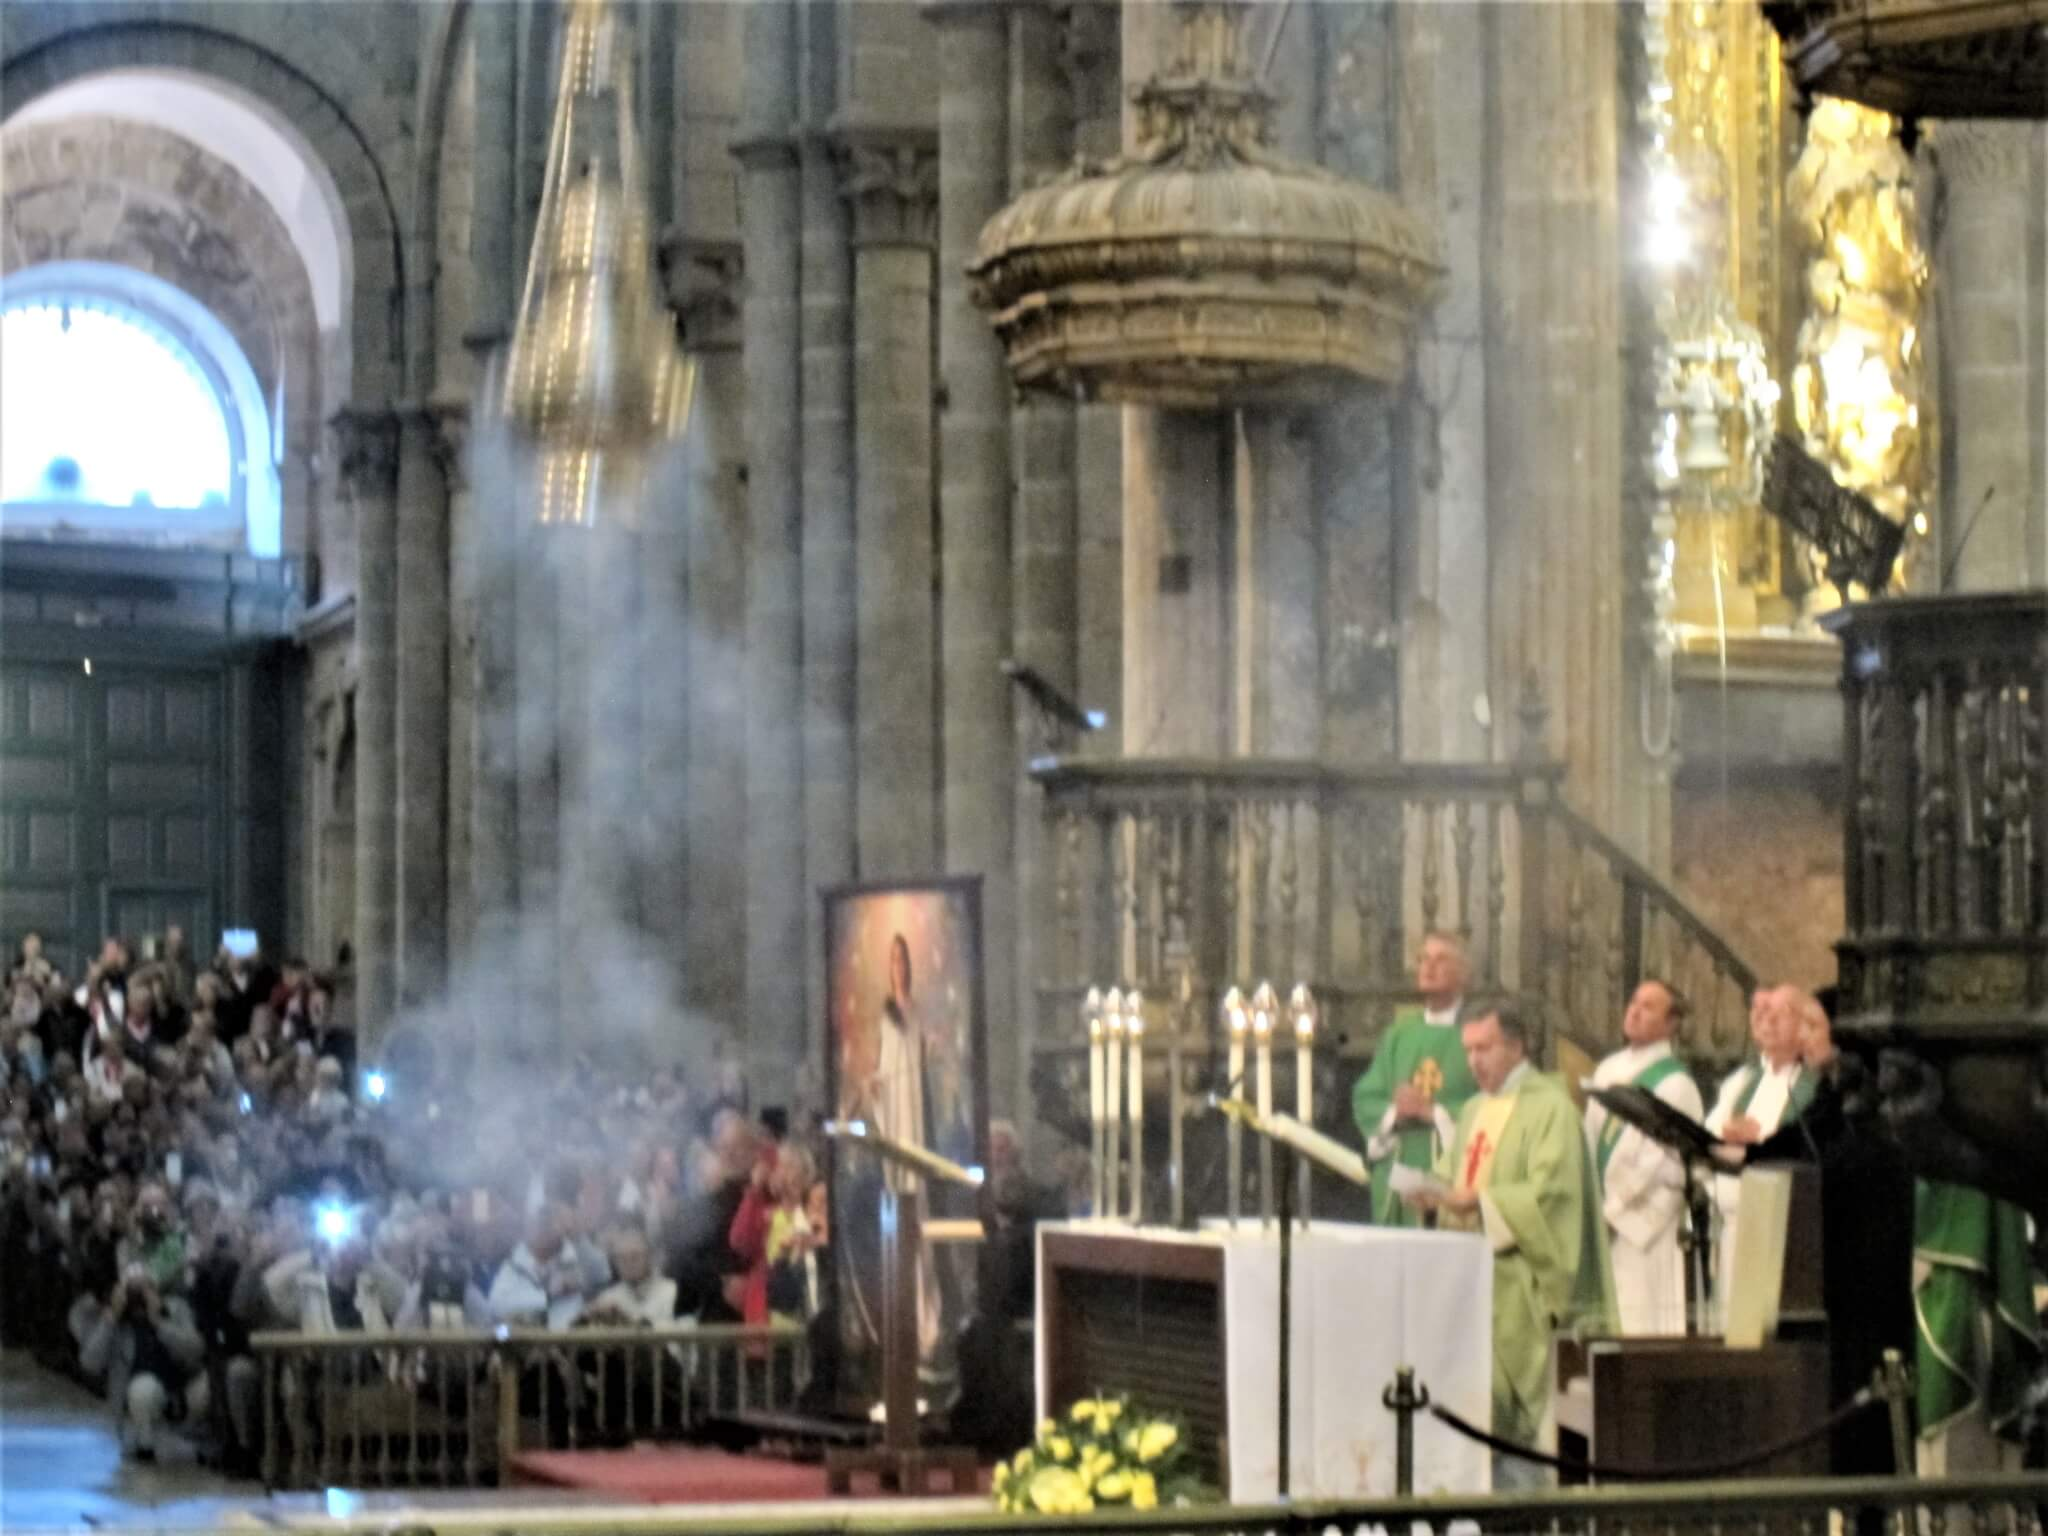 Fatima Pilgrimage - St Wilfrid's Catholic Church, York